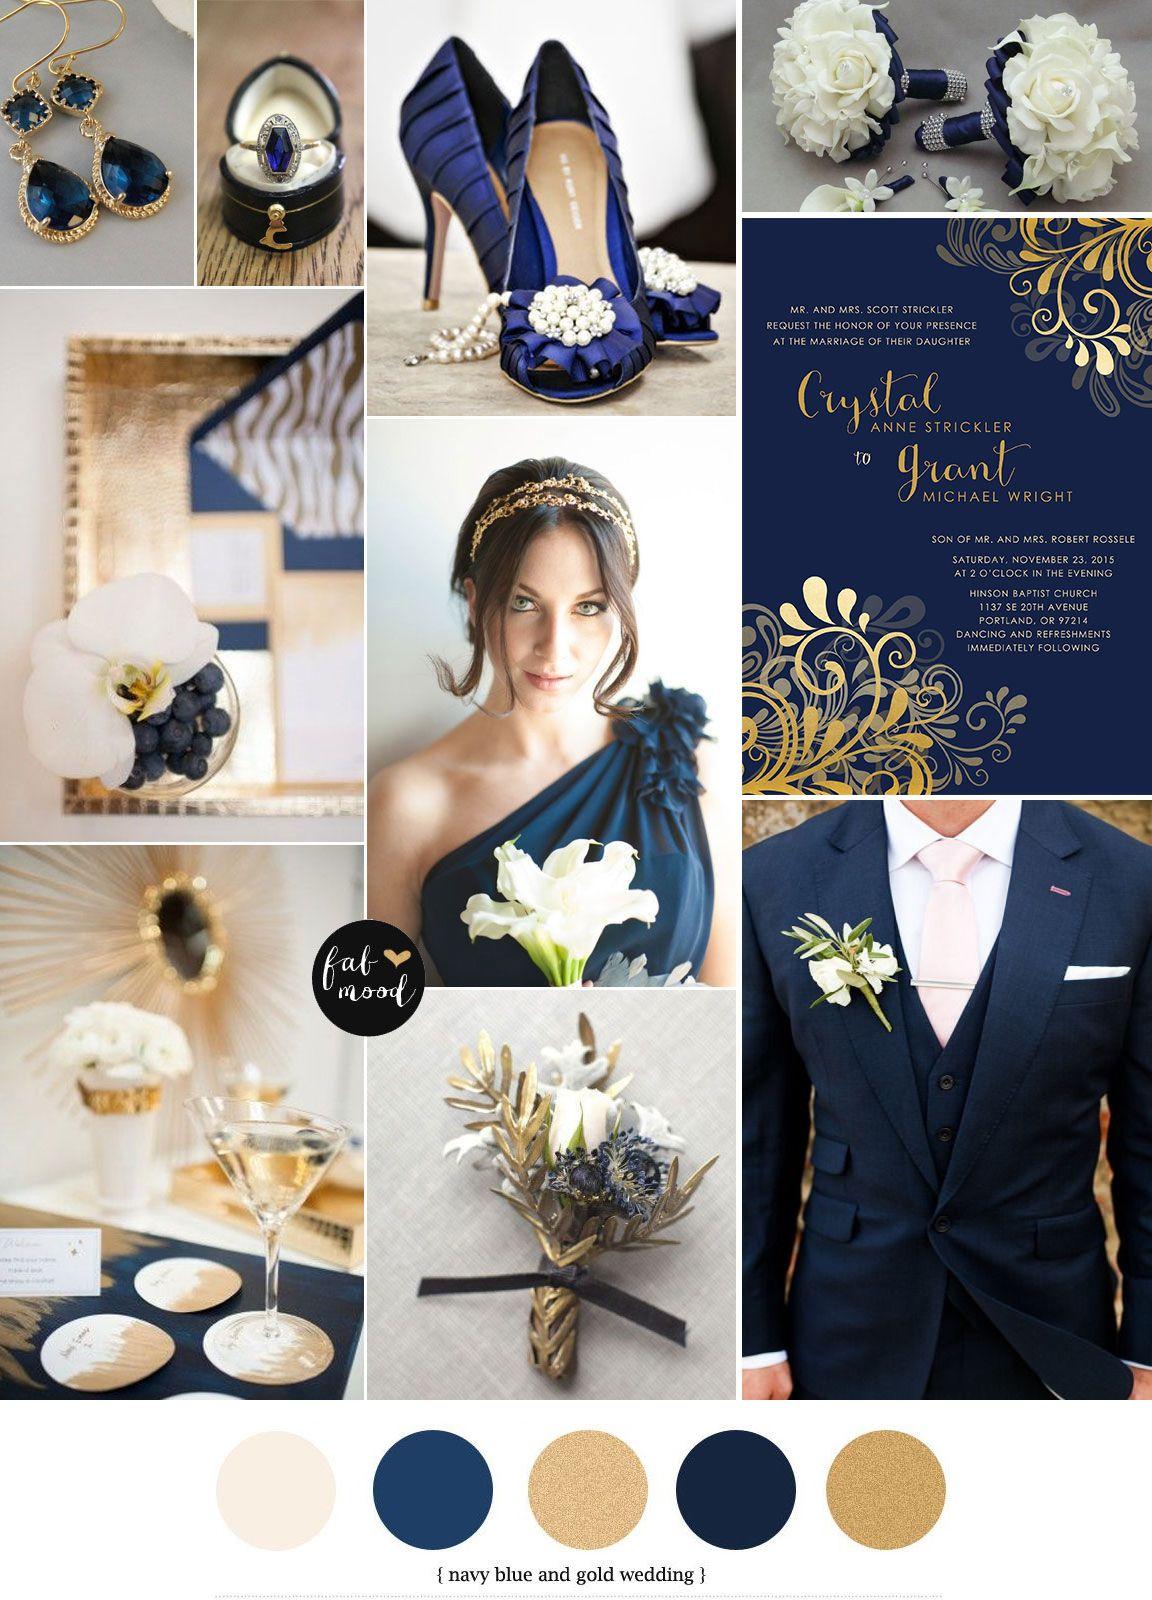 5 year wedding anniversary decorations november 2018 Doug Brown dbrown on Pinterest